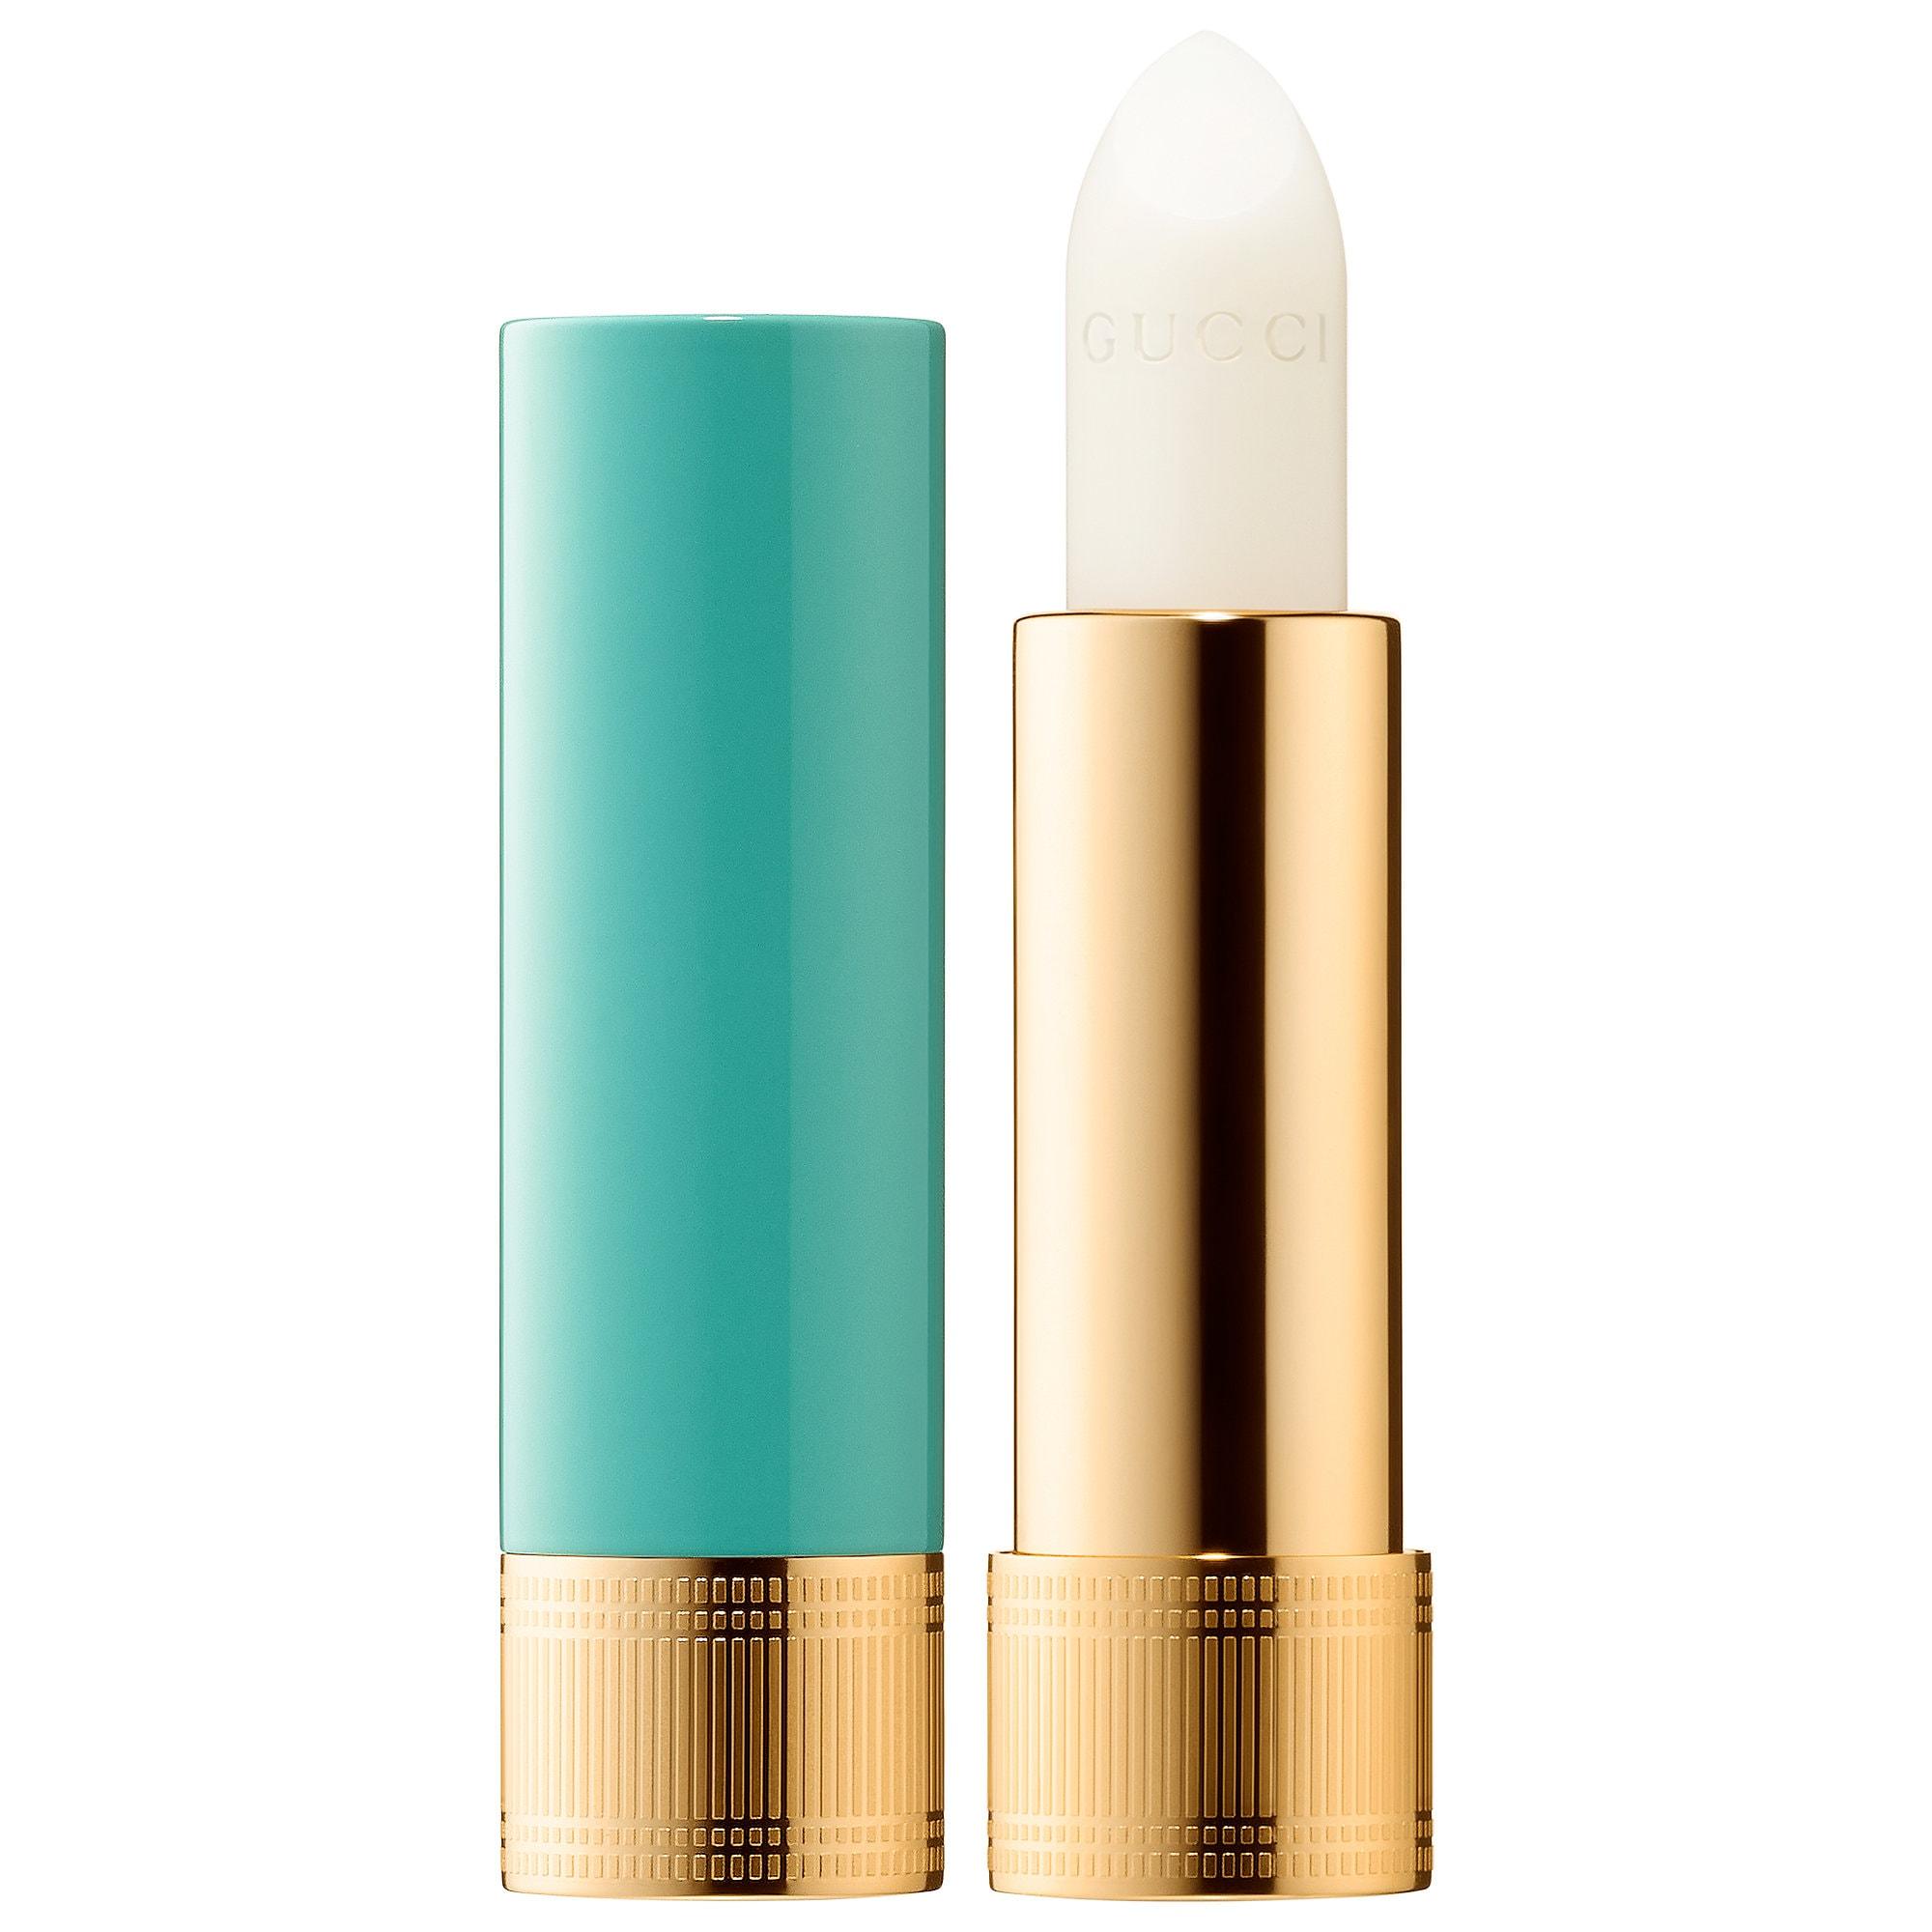 Gucci Baume à Lèvres Lip Balm